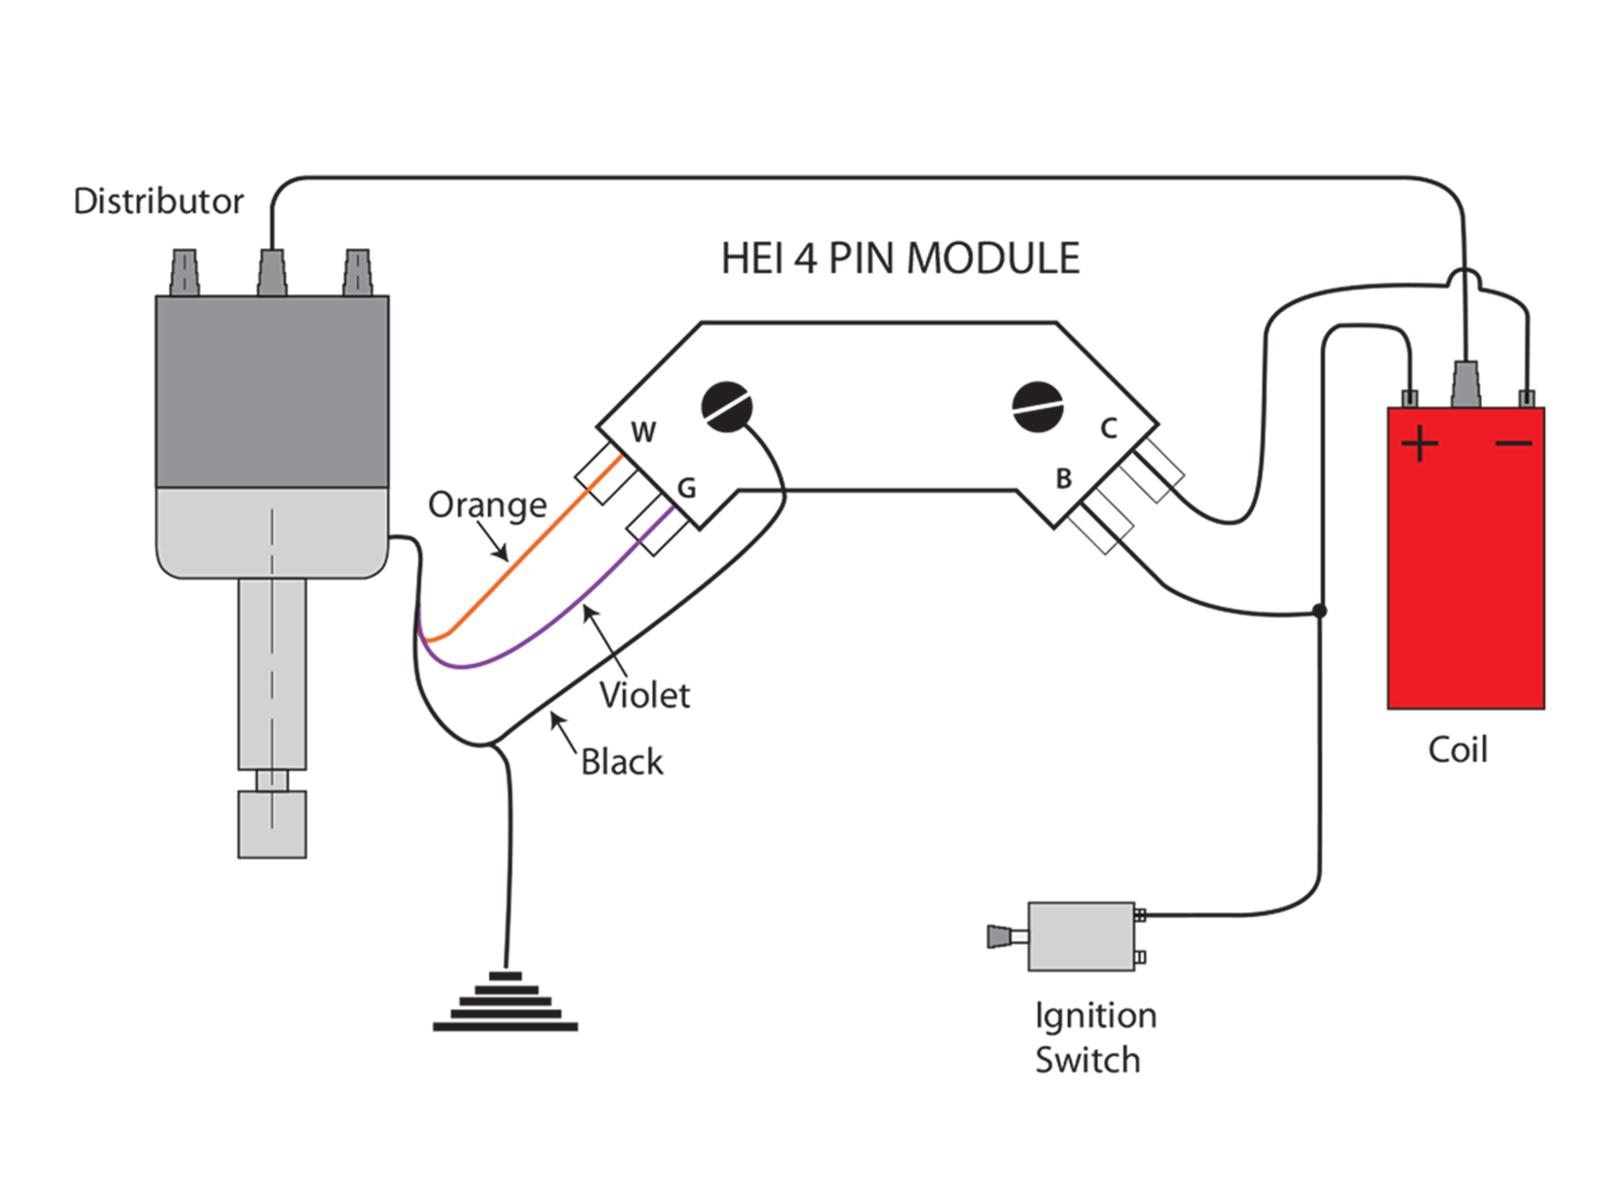 8N Ford Pertronix Ignitor Wiring Diagram   Wiring Diagram - Pertronix Ignitor Wiring Diagram